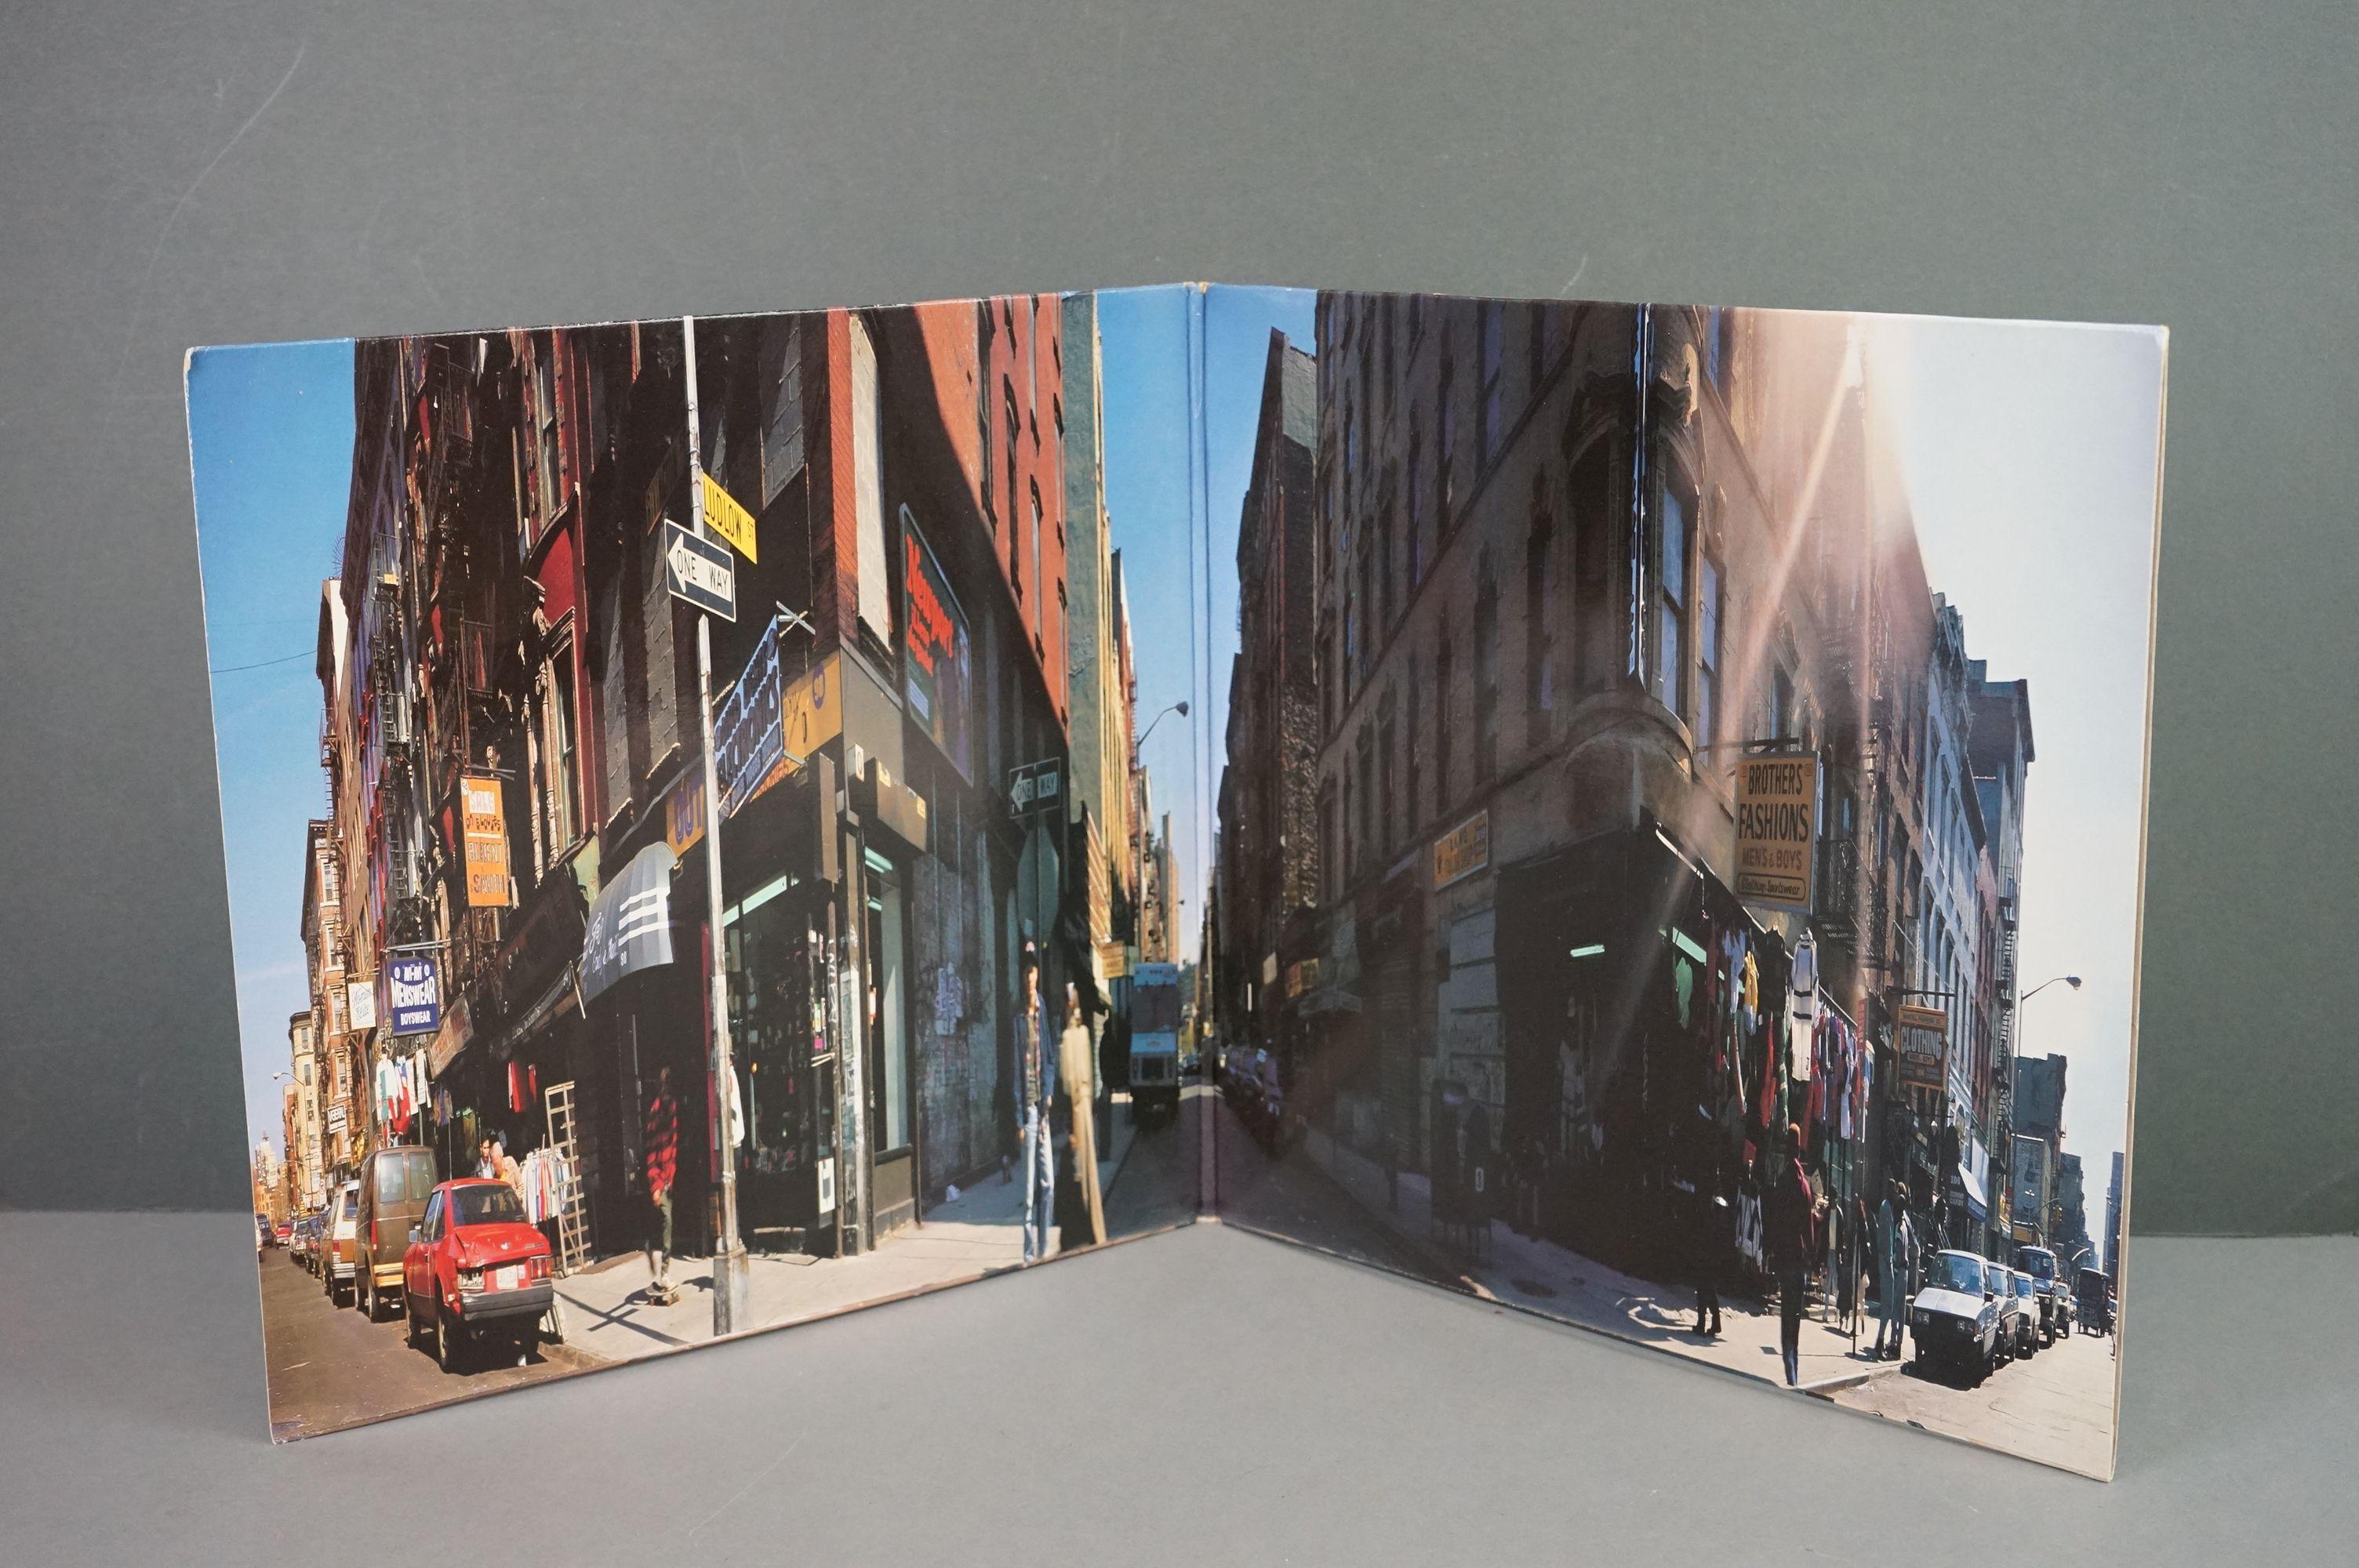 Vinyl - Beastie Boys Paul's Boutique LP on Capitol UK 077779174317 UKEST2102 with 'promotional - Image 2 of 6